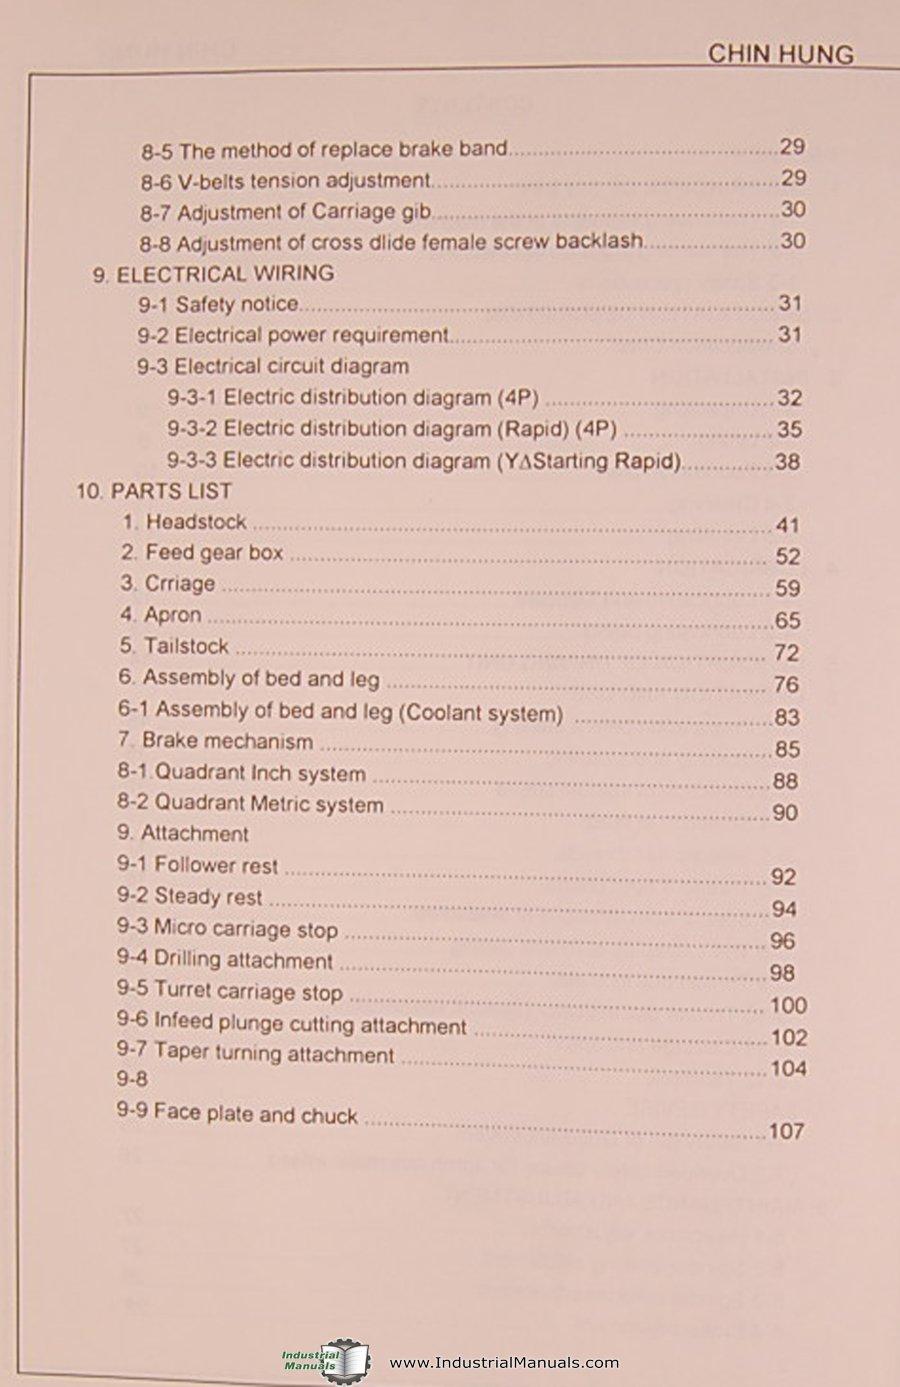 Kingston Series CHD 560, CHD-660 CHD-760, Lathe, Operations Installation  Maitnenance Service Parts Manual: Kingston: Amazon.com: Books